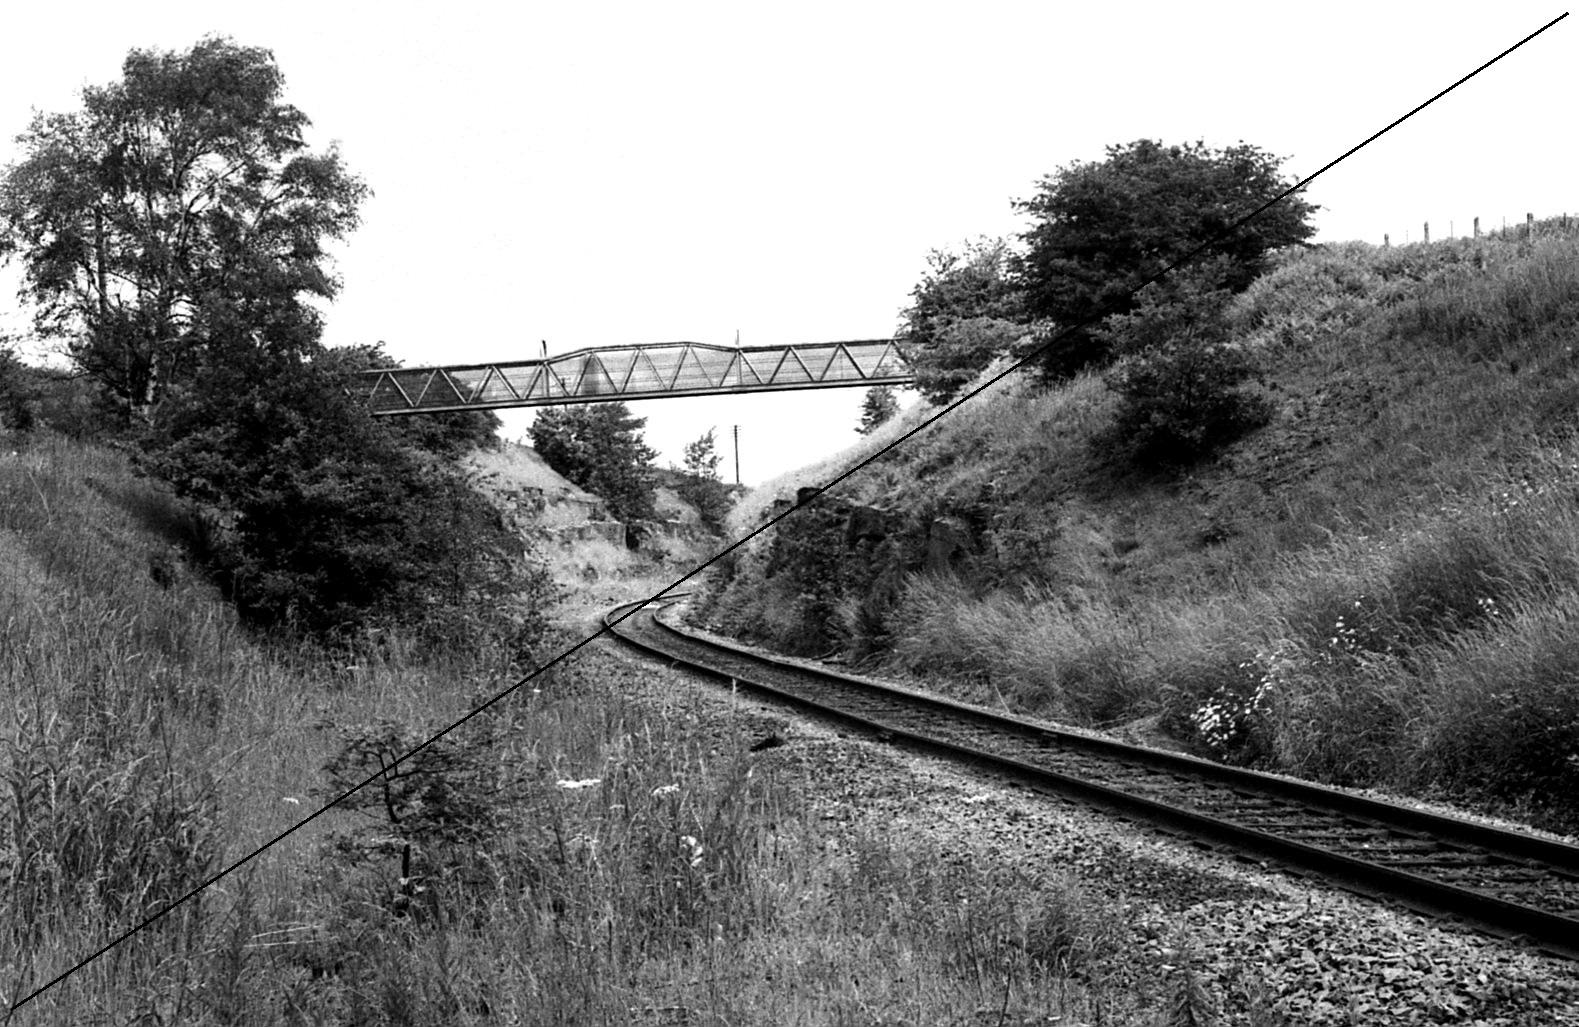 LDE001-Upperthorpe and Killamarsh Station Site-Looking North Towards Beighton-16-06-1977.jpg